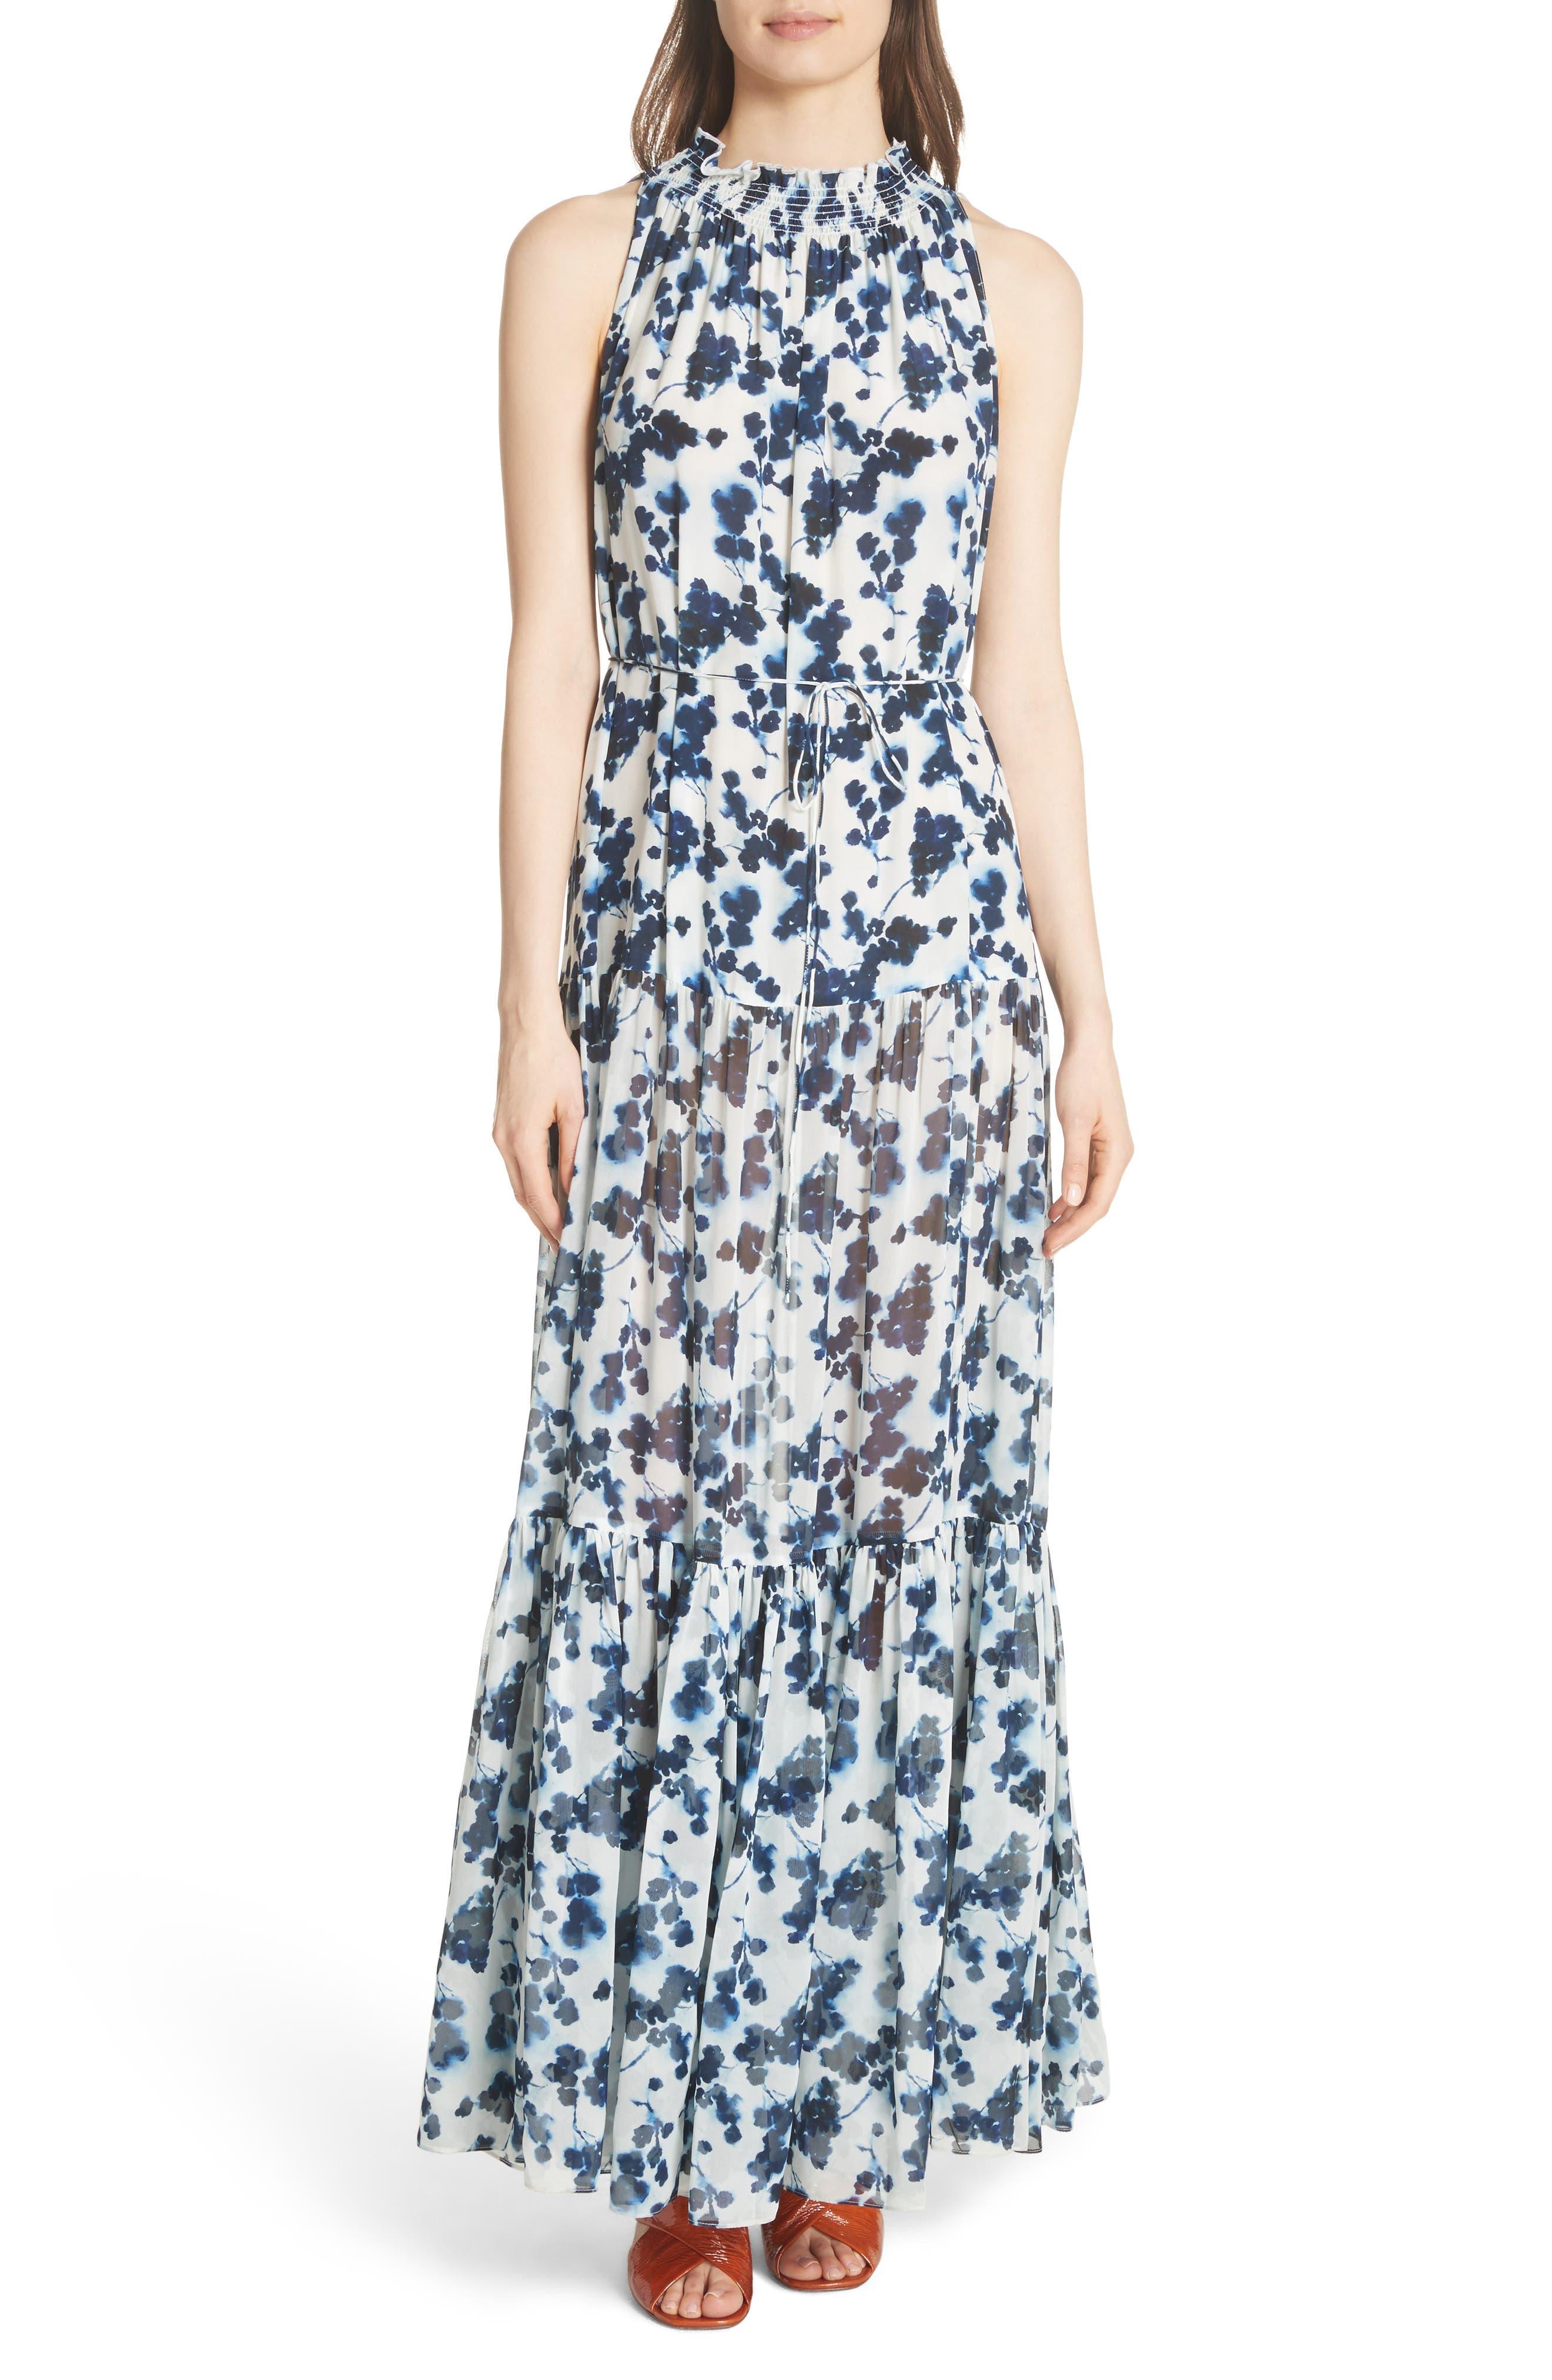 Main Image - Elizabeth and James Lani P Floral Print Silk Dress